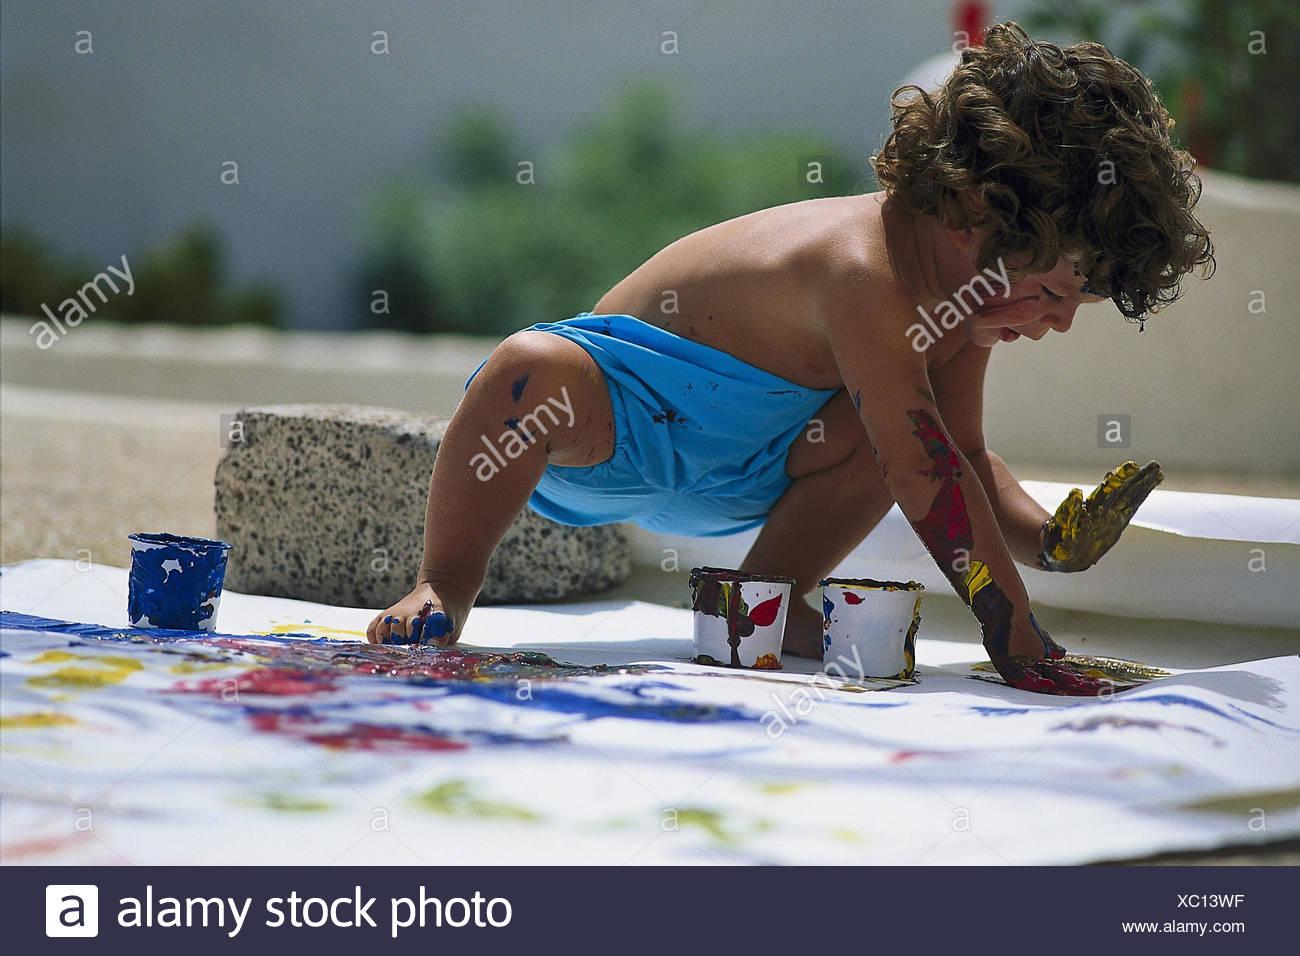 Terrasse, Kind, den Oberkörper frei, Fußboden, Farbe Töpfe, hell ...